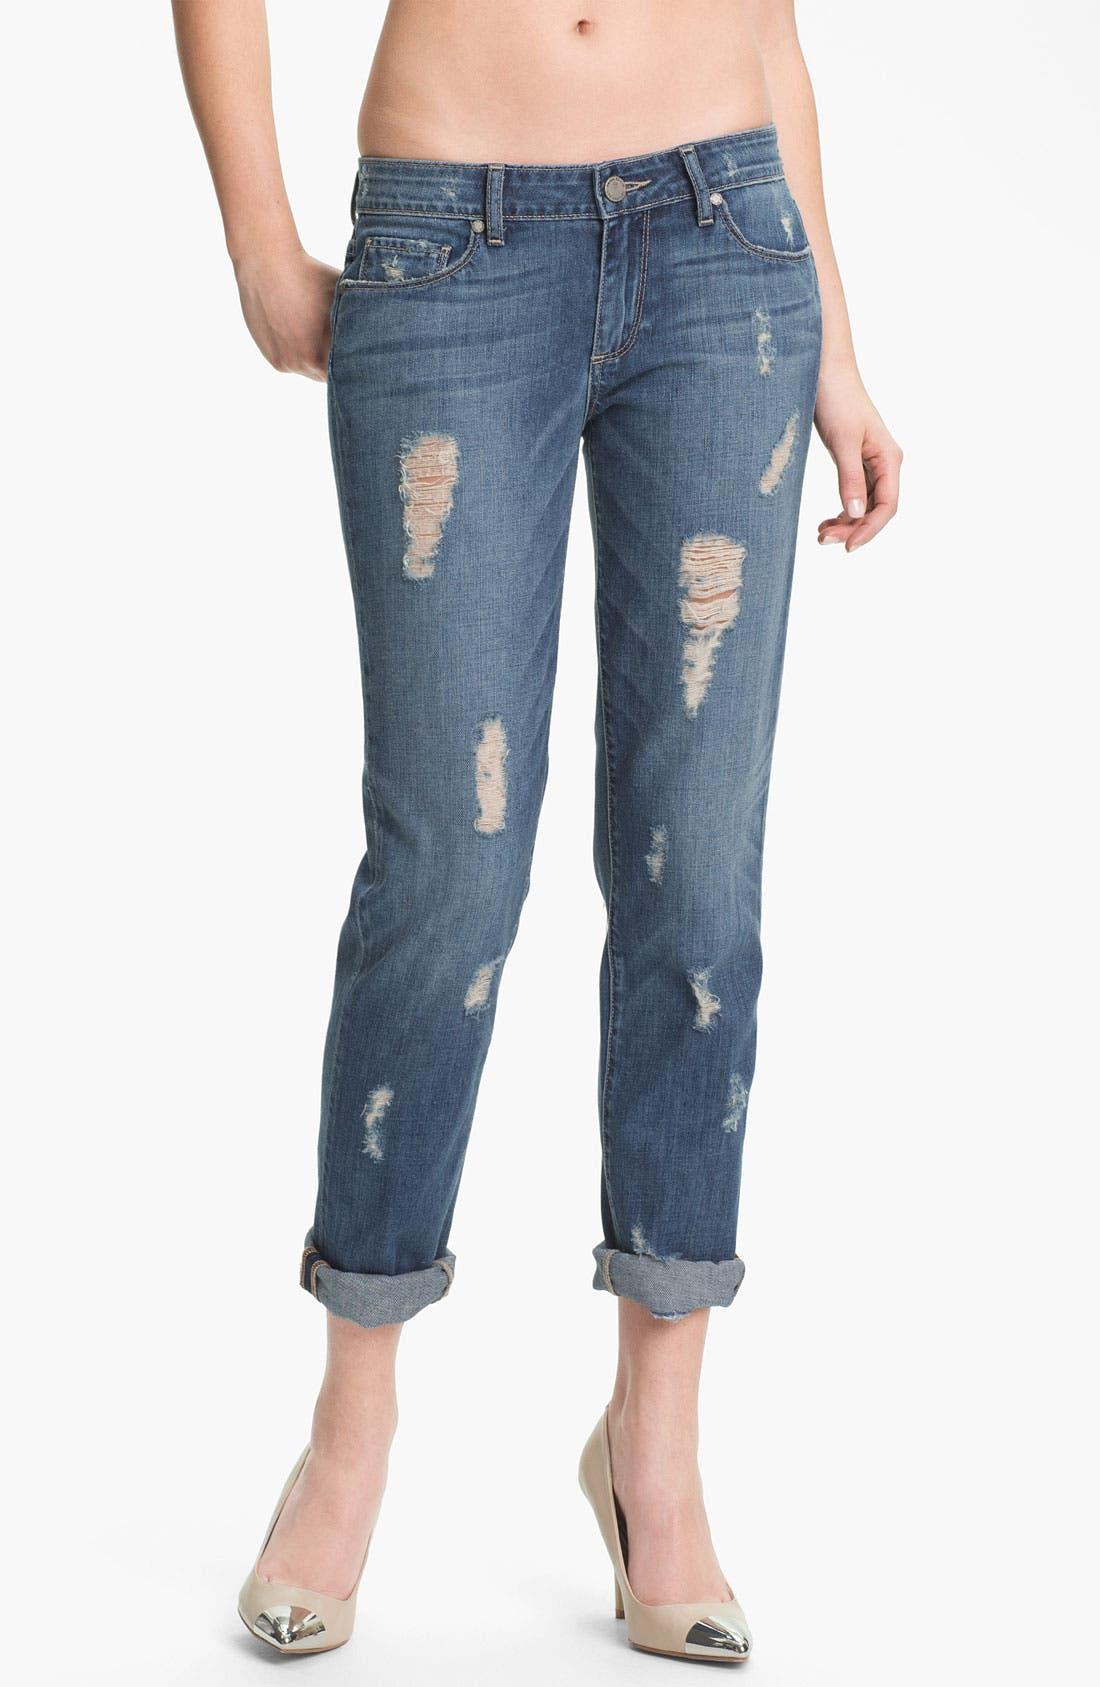 Main Image - Paige Denim 'Jimmy Jimmy' Distressed Skinny Jeans (Riley Destruction)